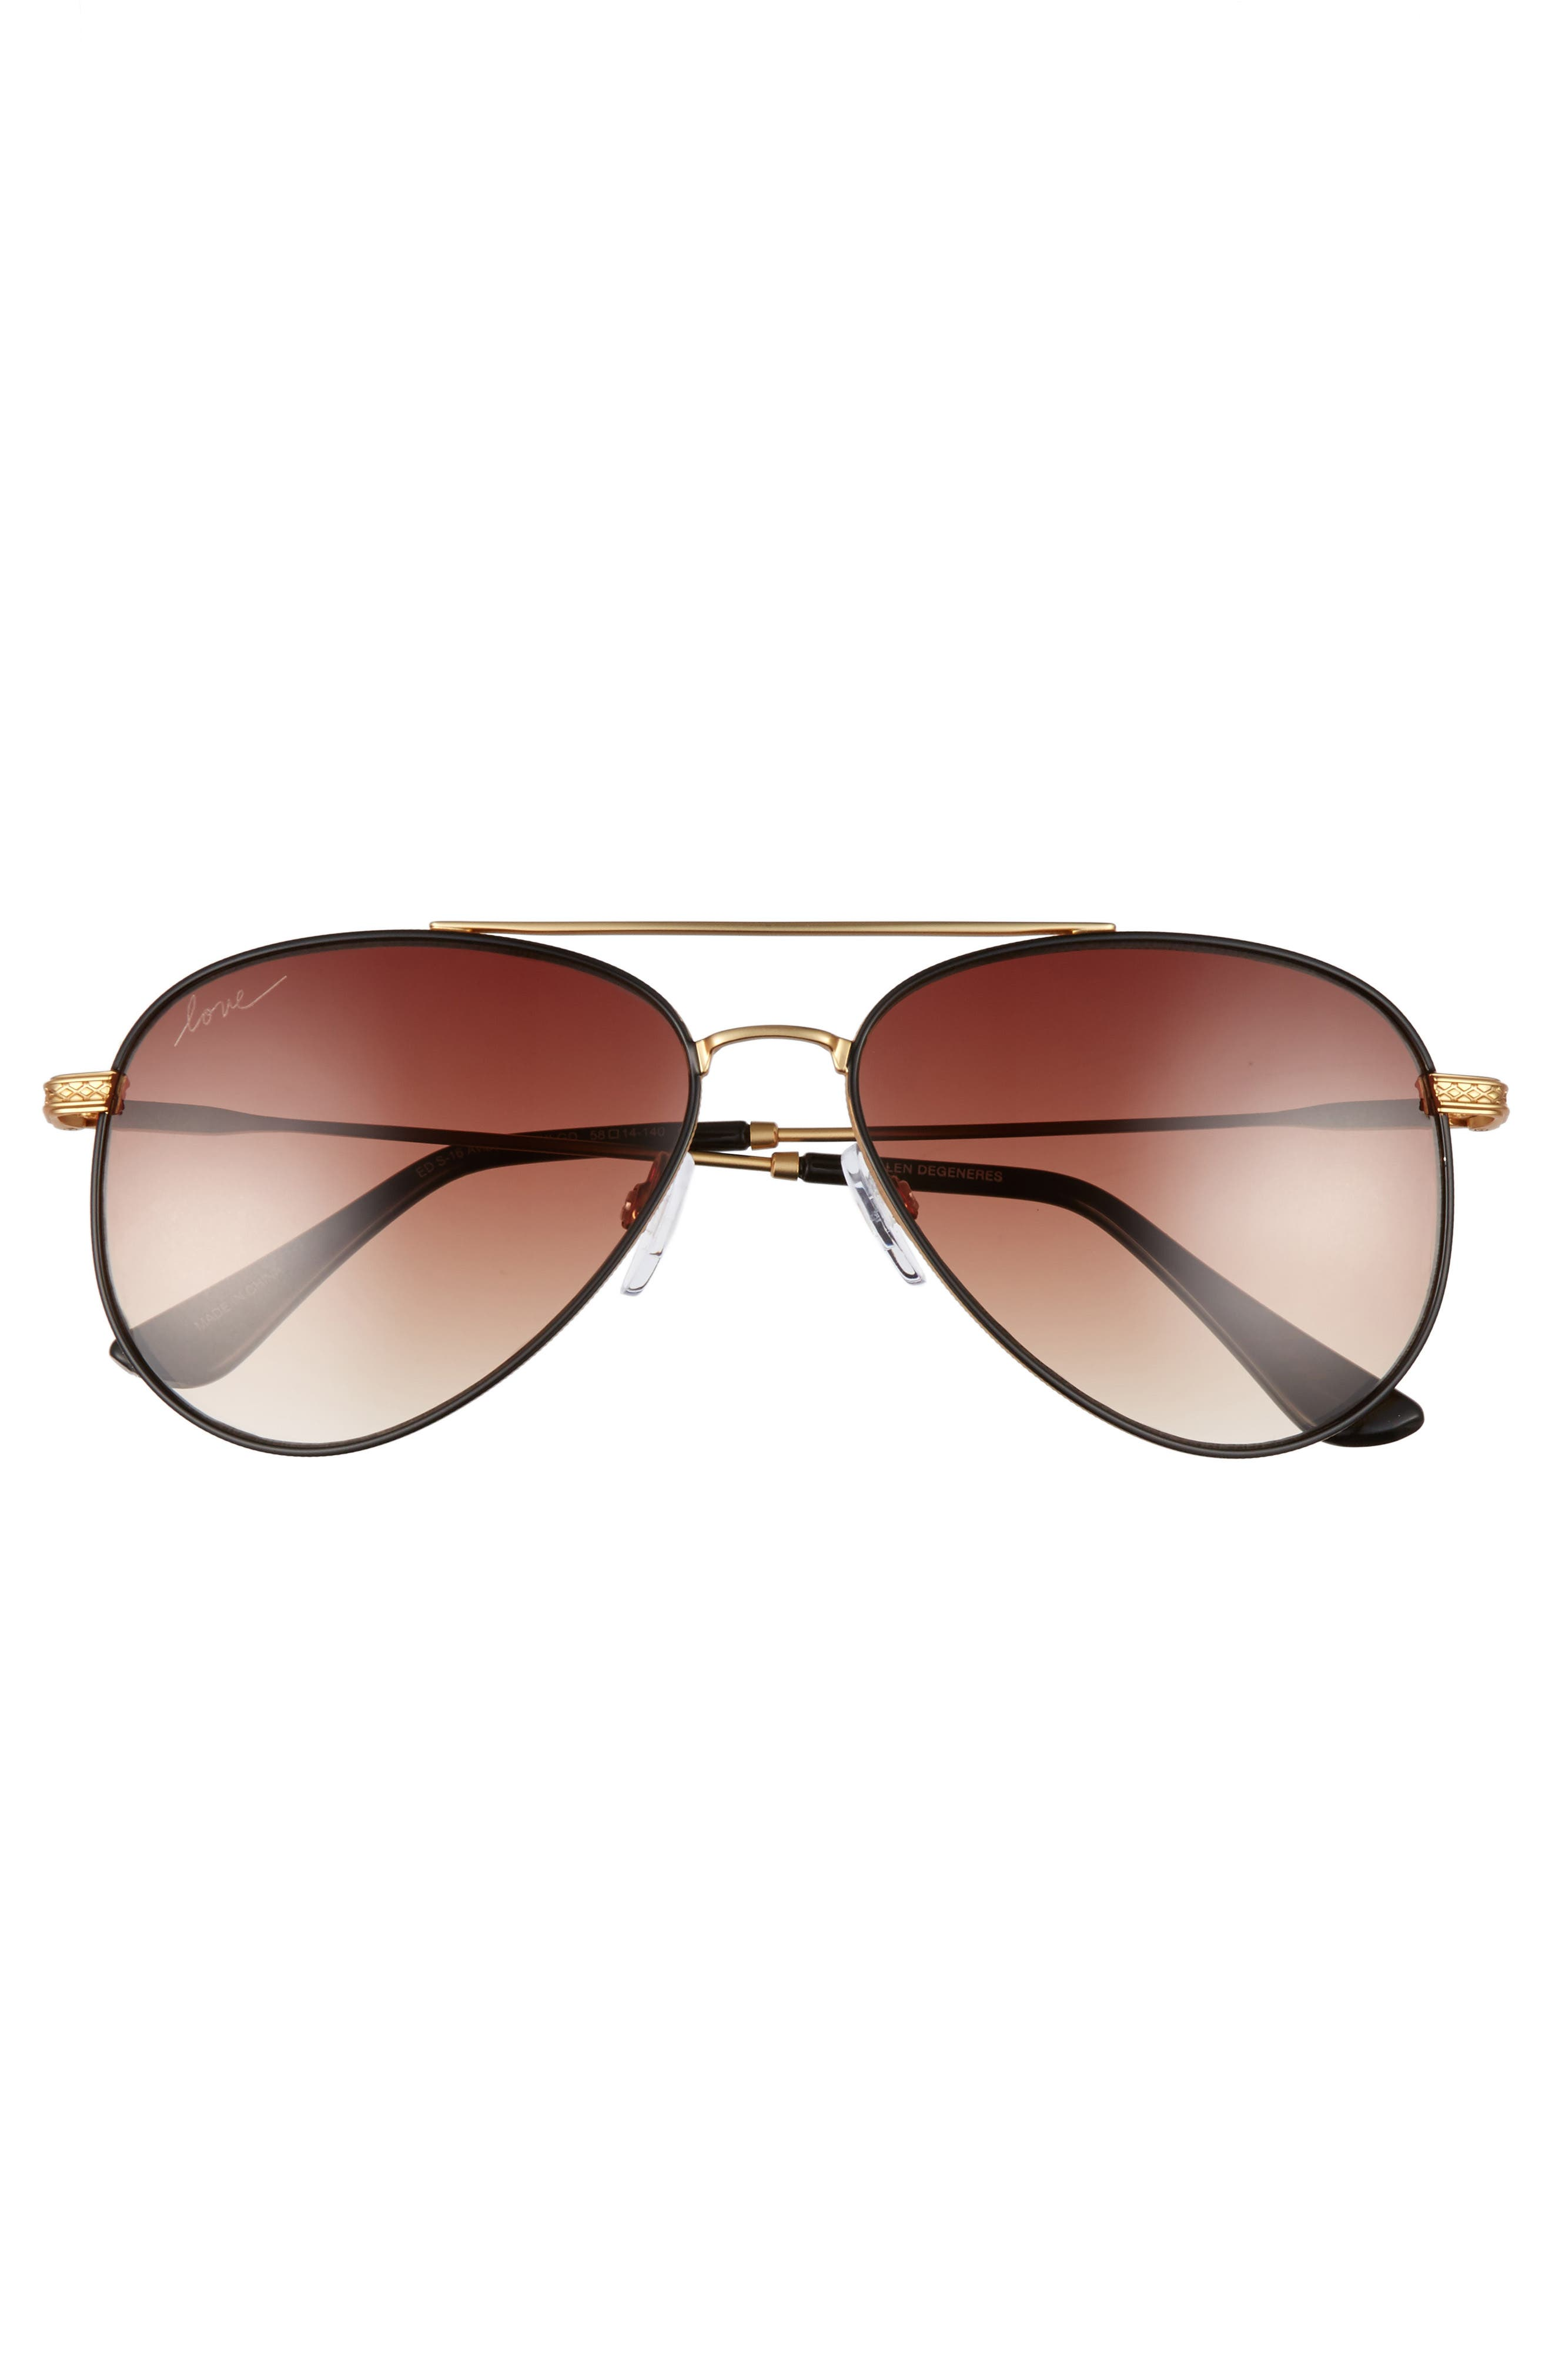 58mm Aviator Sunglasses,                             Alternate thumbnail 9, color,